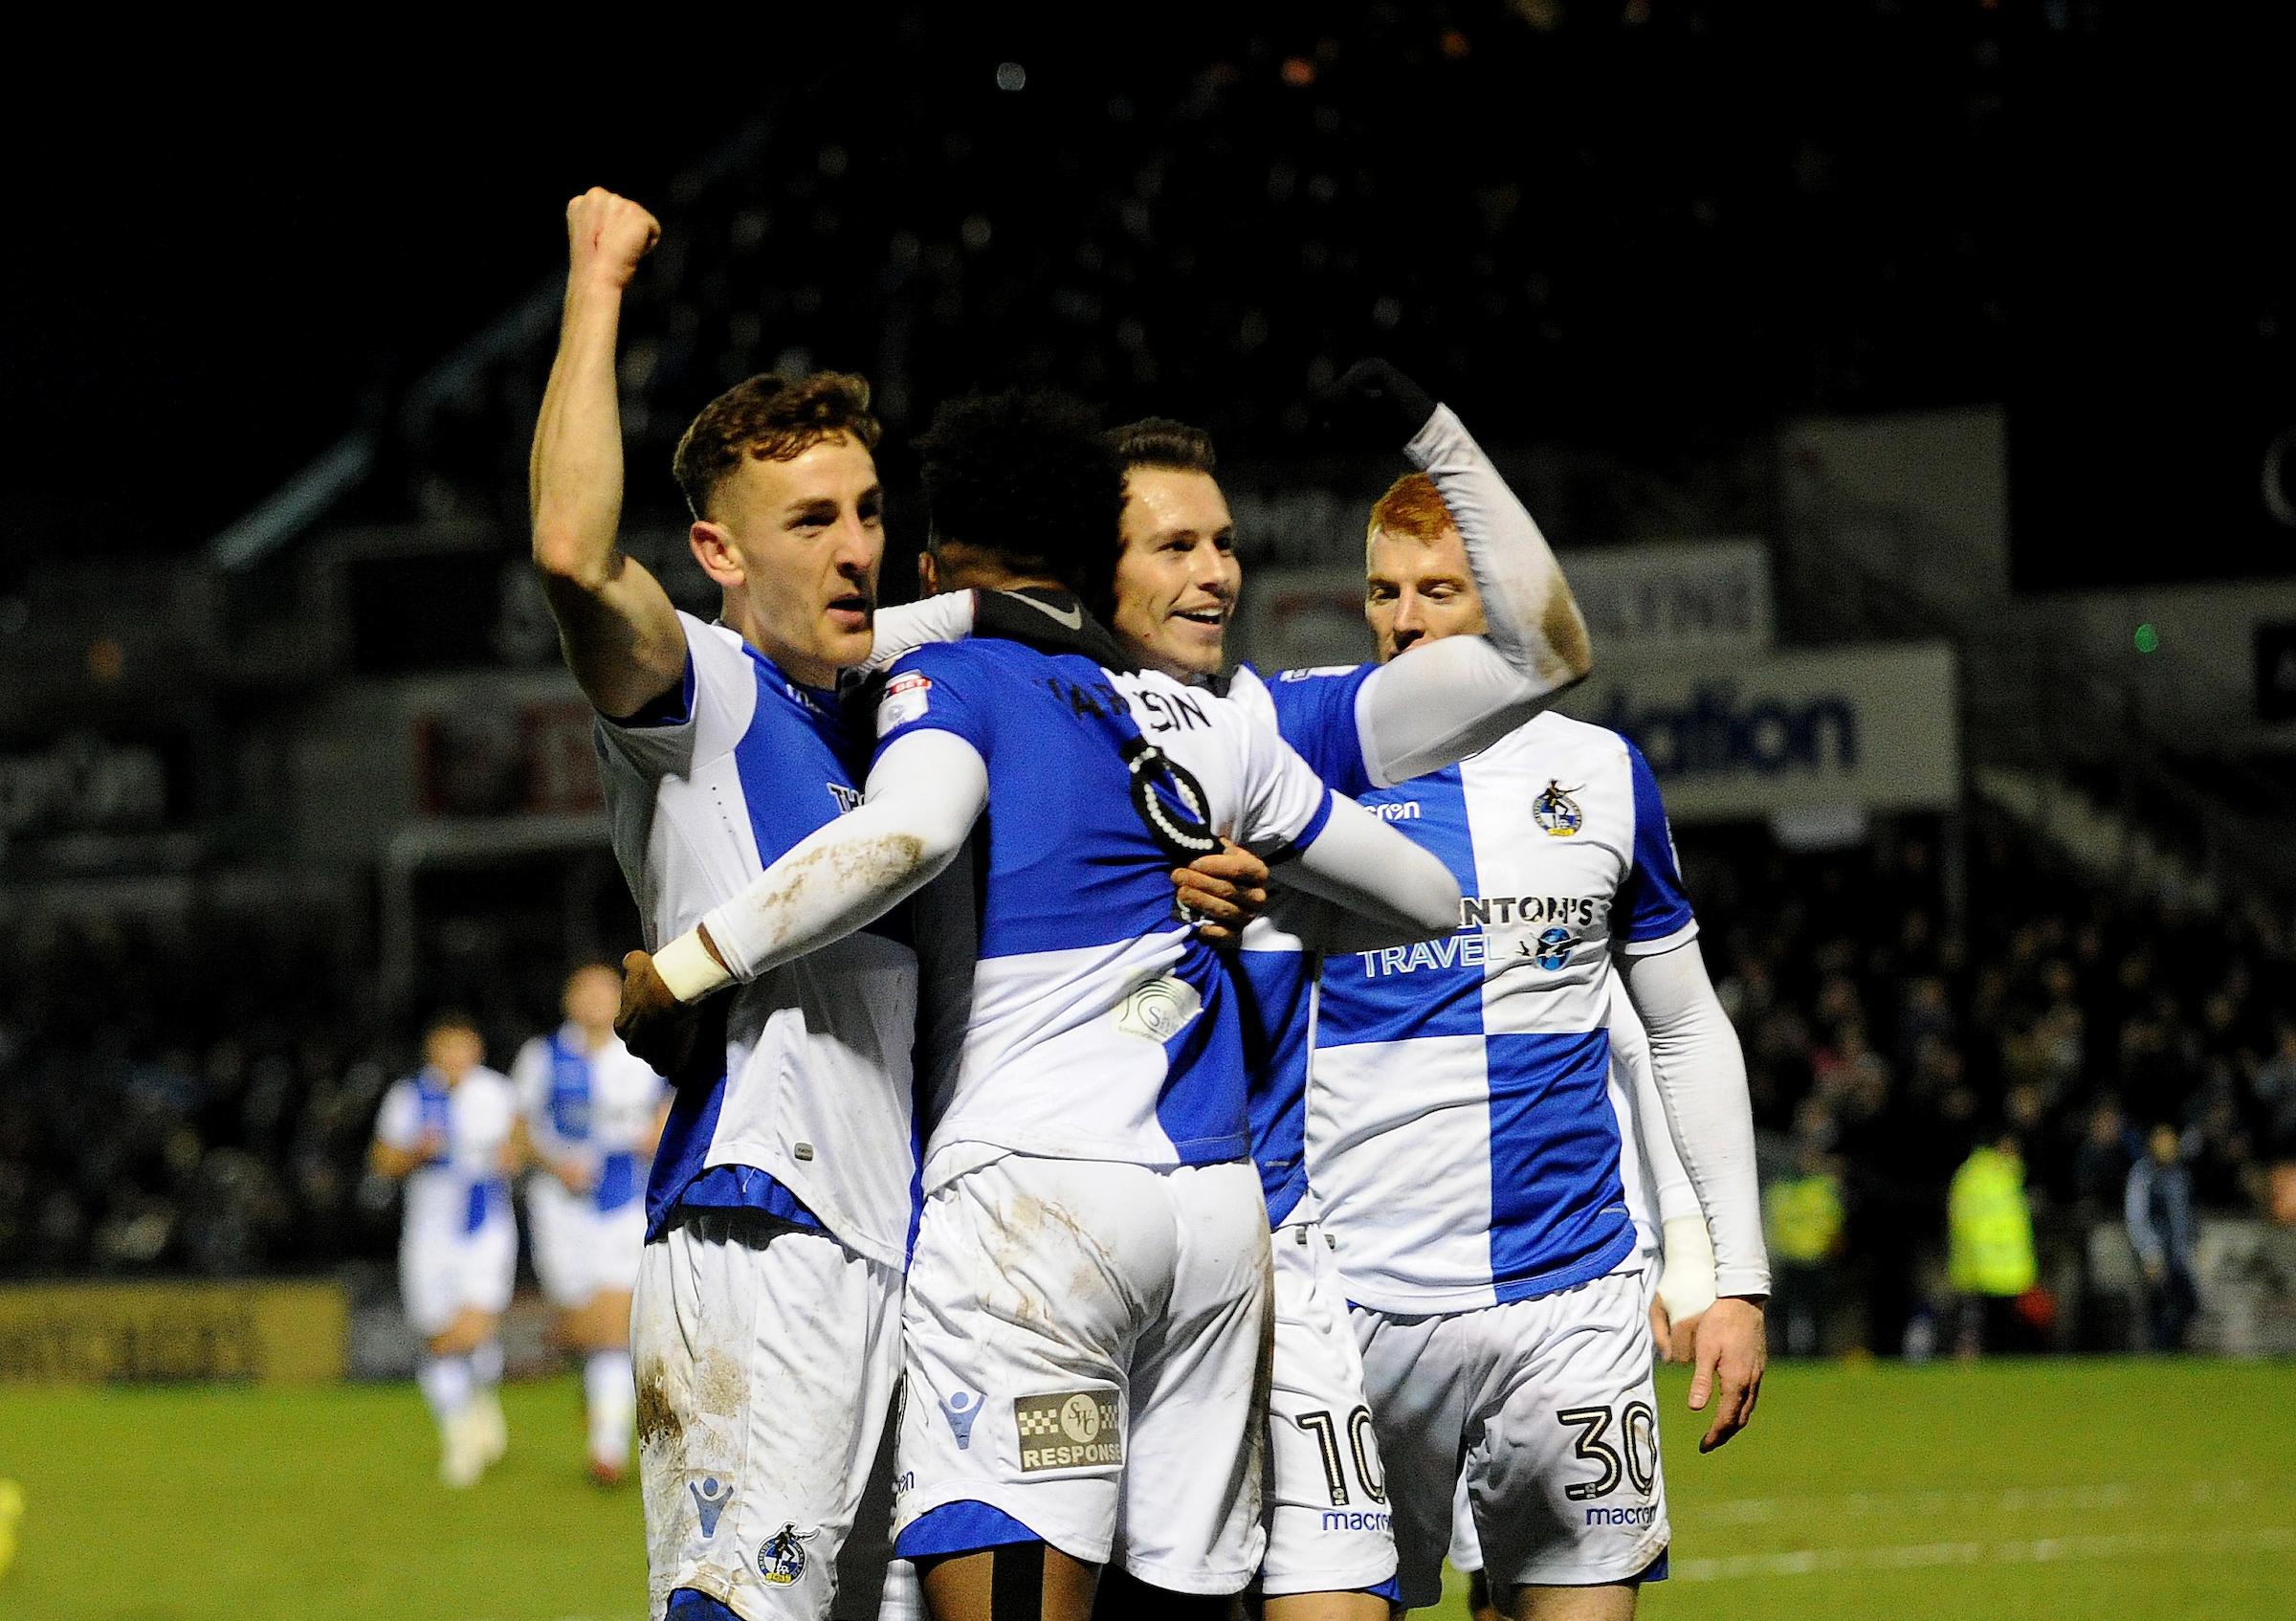 JMP_Bristol_Rovers_v_Southend_United_NB026.jpg